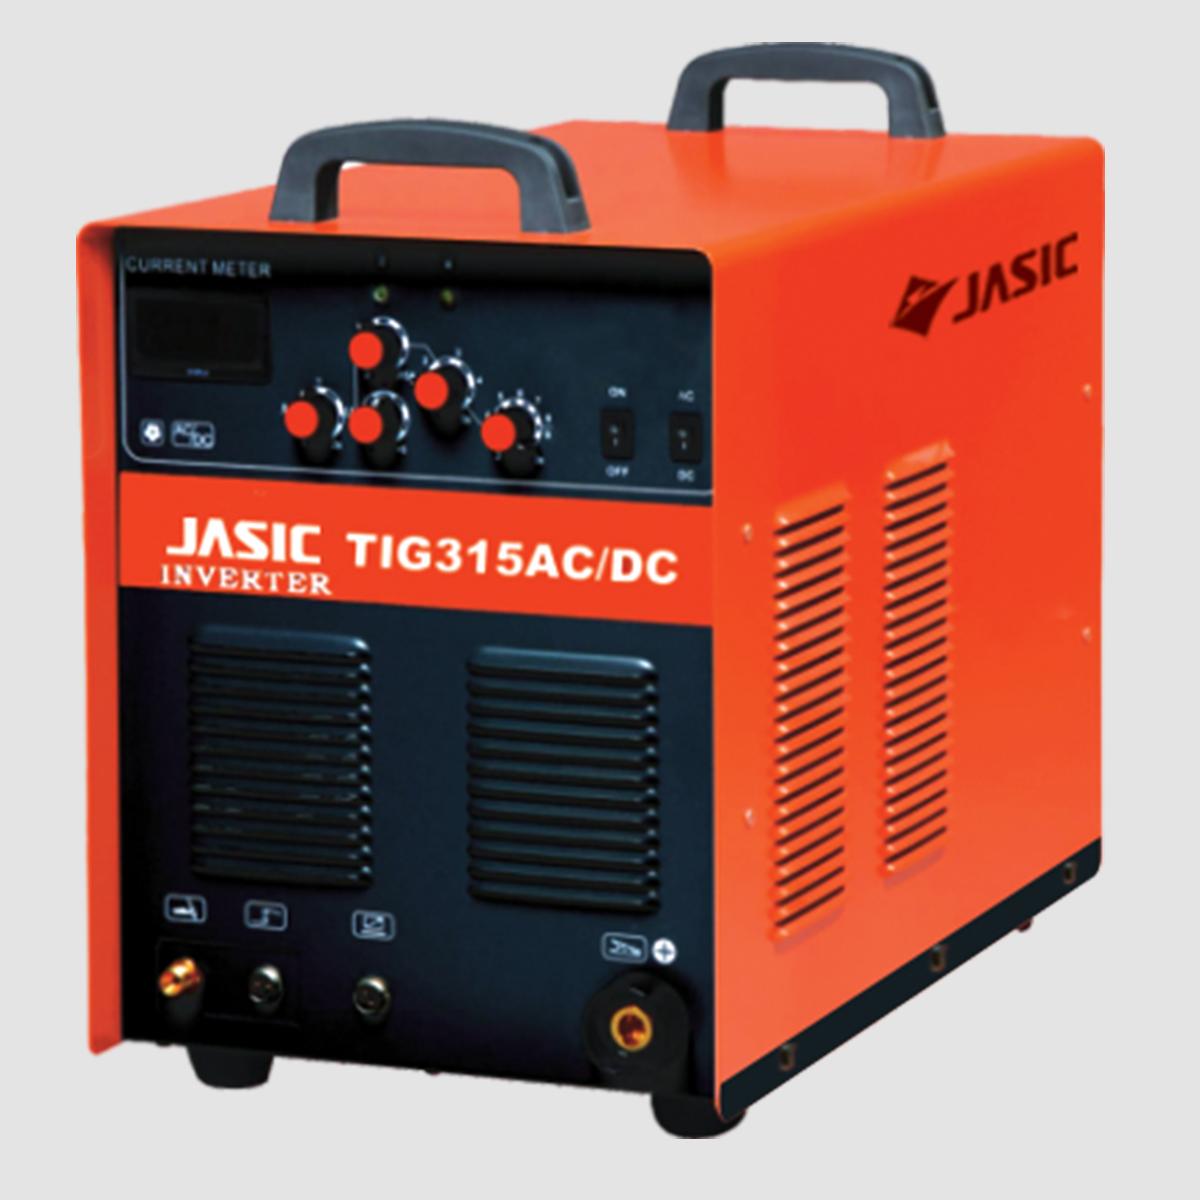 jasic inverter Tig 315AC/DC Jasic